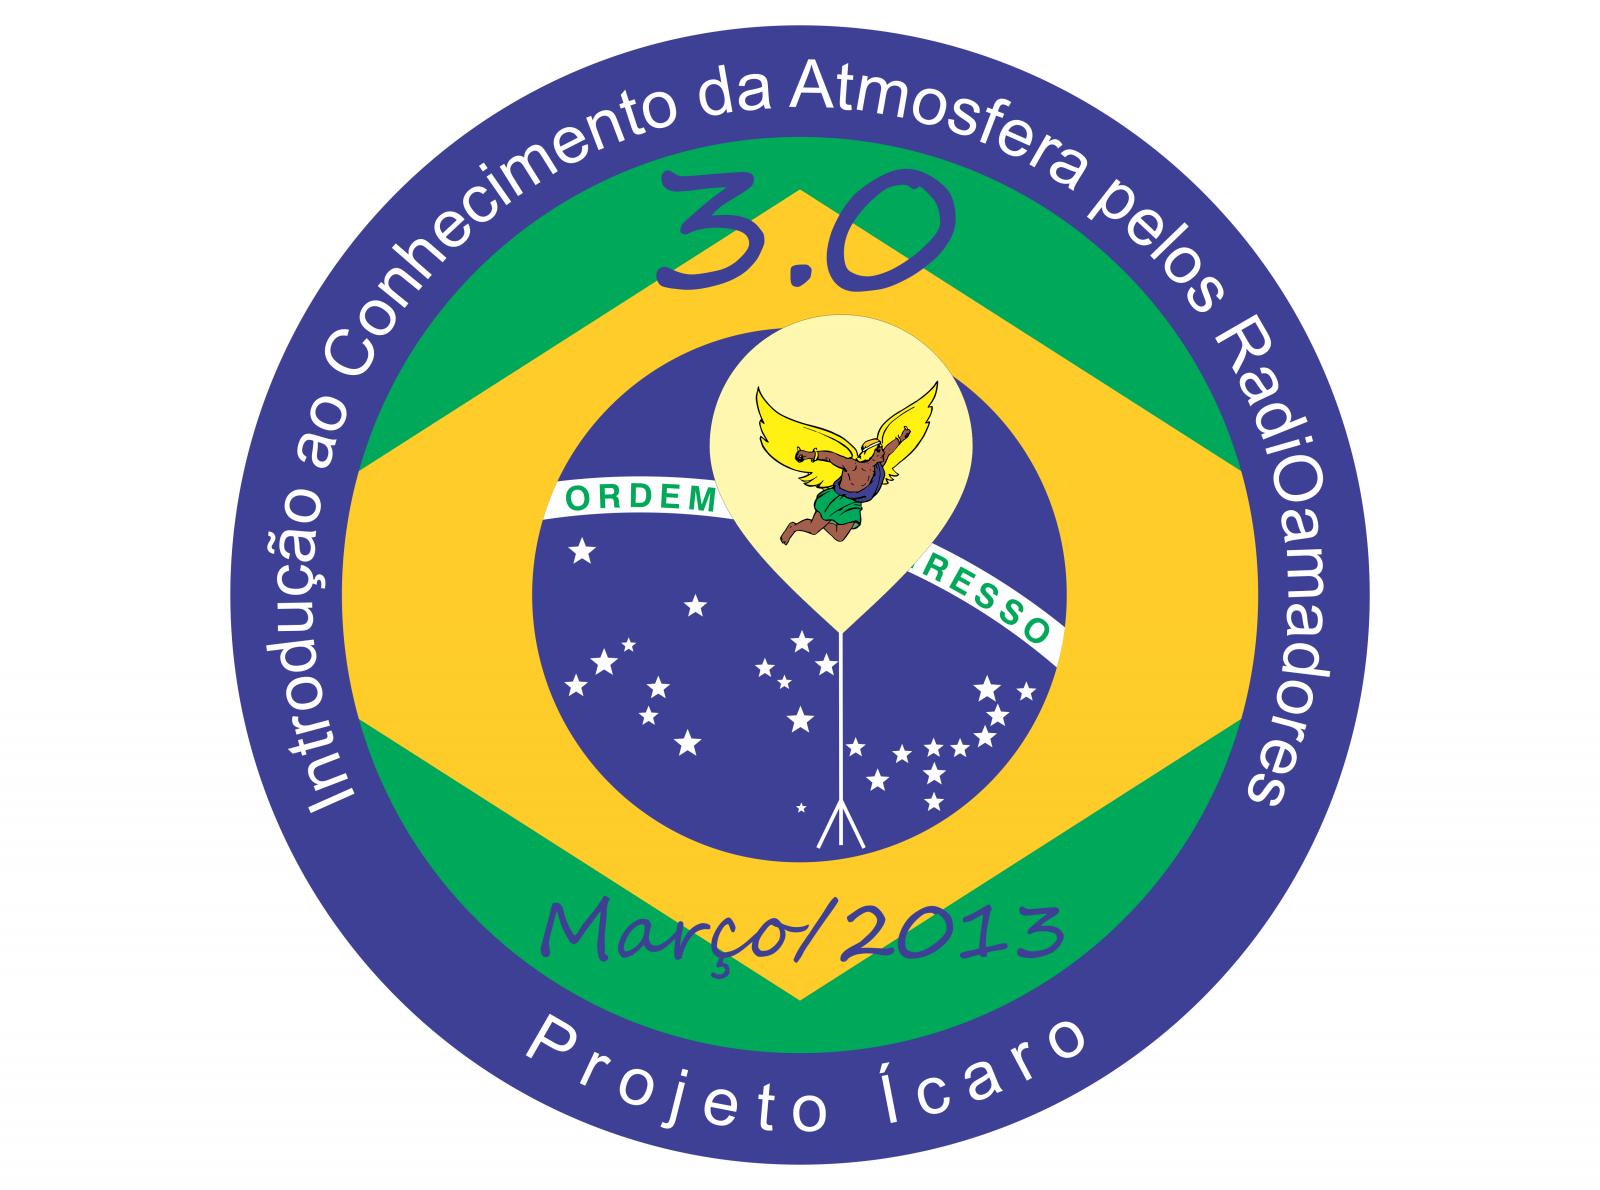 Projeto ICARO